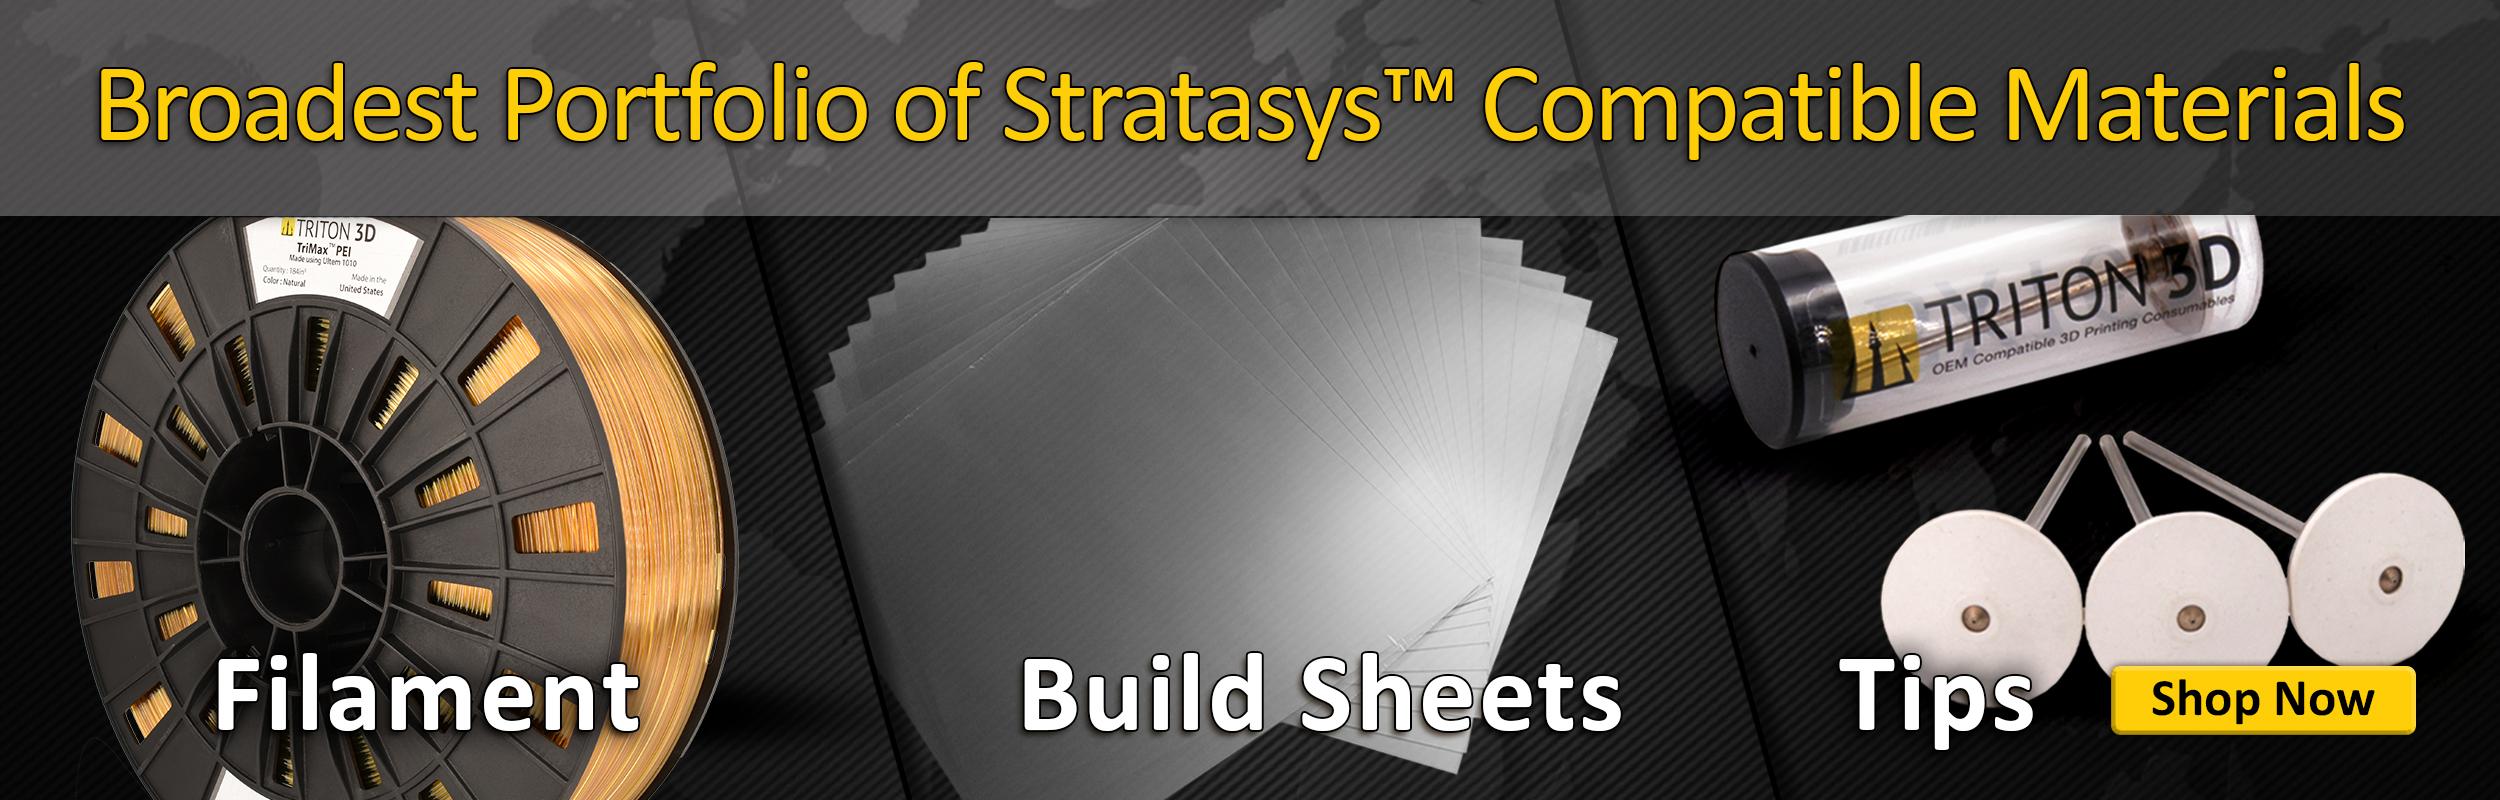 Broadest portfolio of stratasys compatible materials on the market